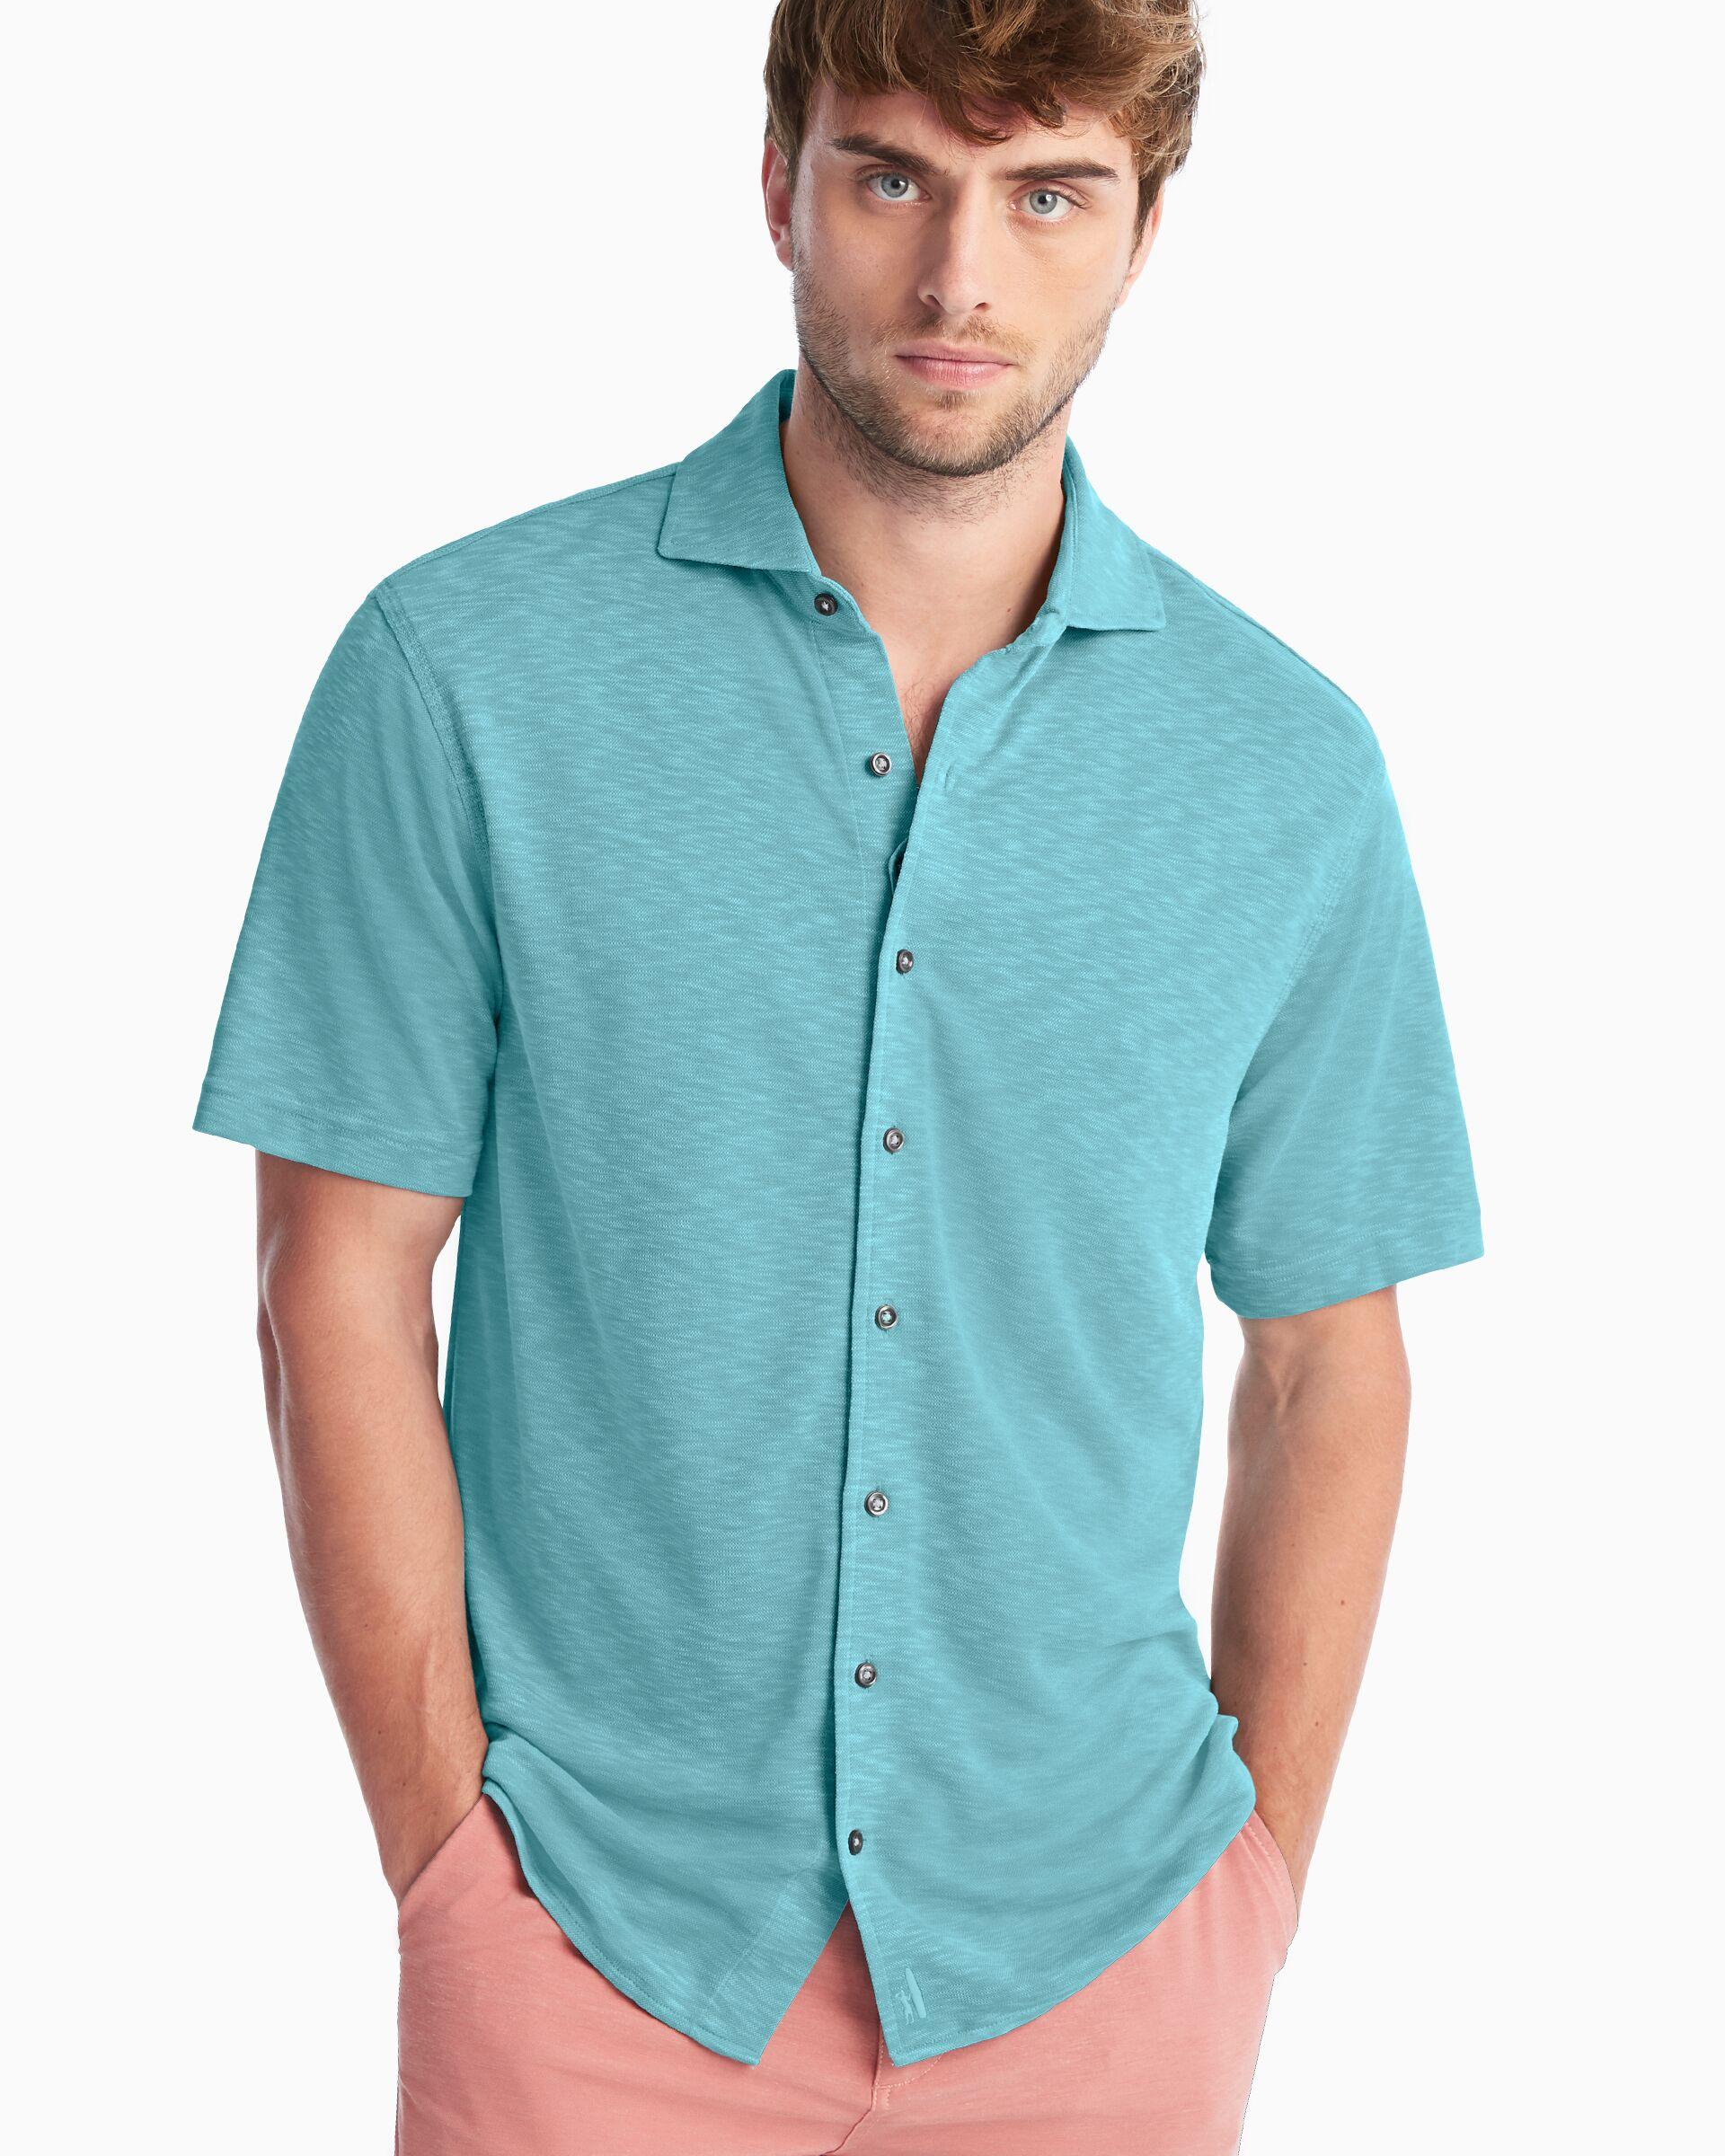 Stokes Prep-Formance Short Sleeve Button Down Shirt (Seafoam)